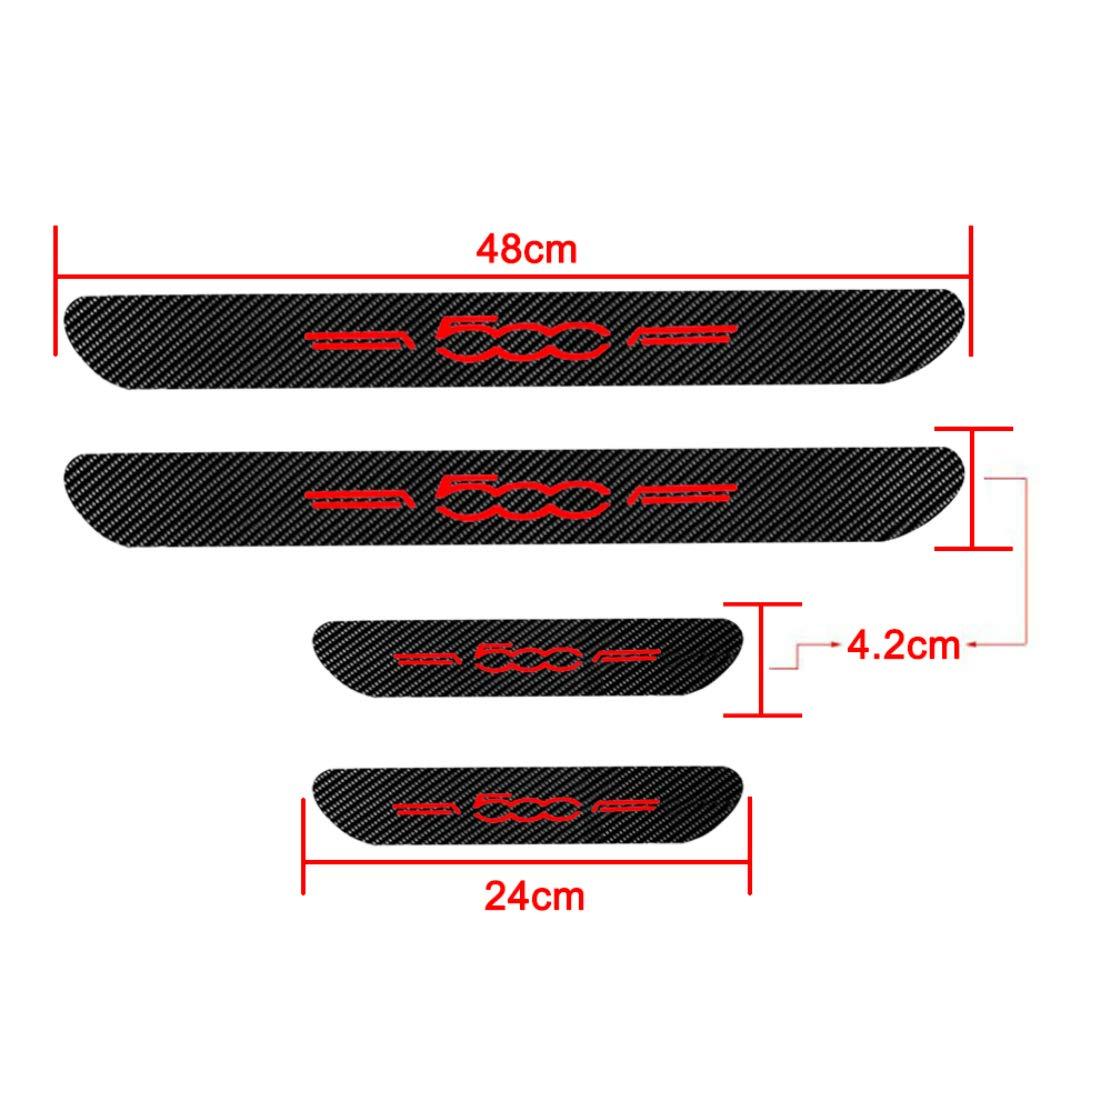 For 500 Car Door Sill Scuff Plate Guard Sills Protector Trim Carbon Fiber Stickers 4pcs White